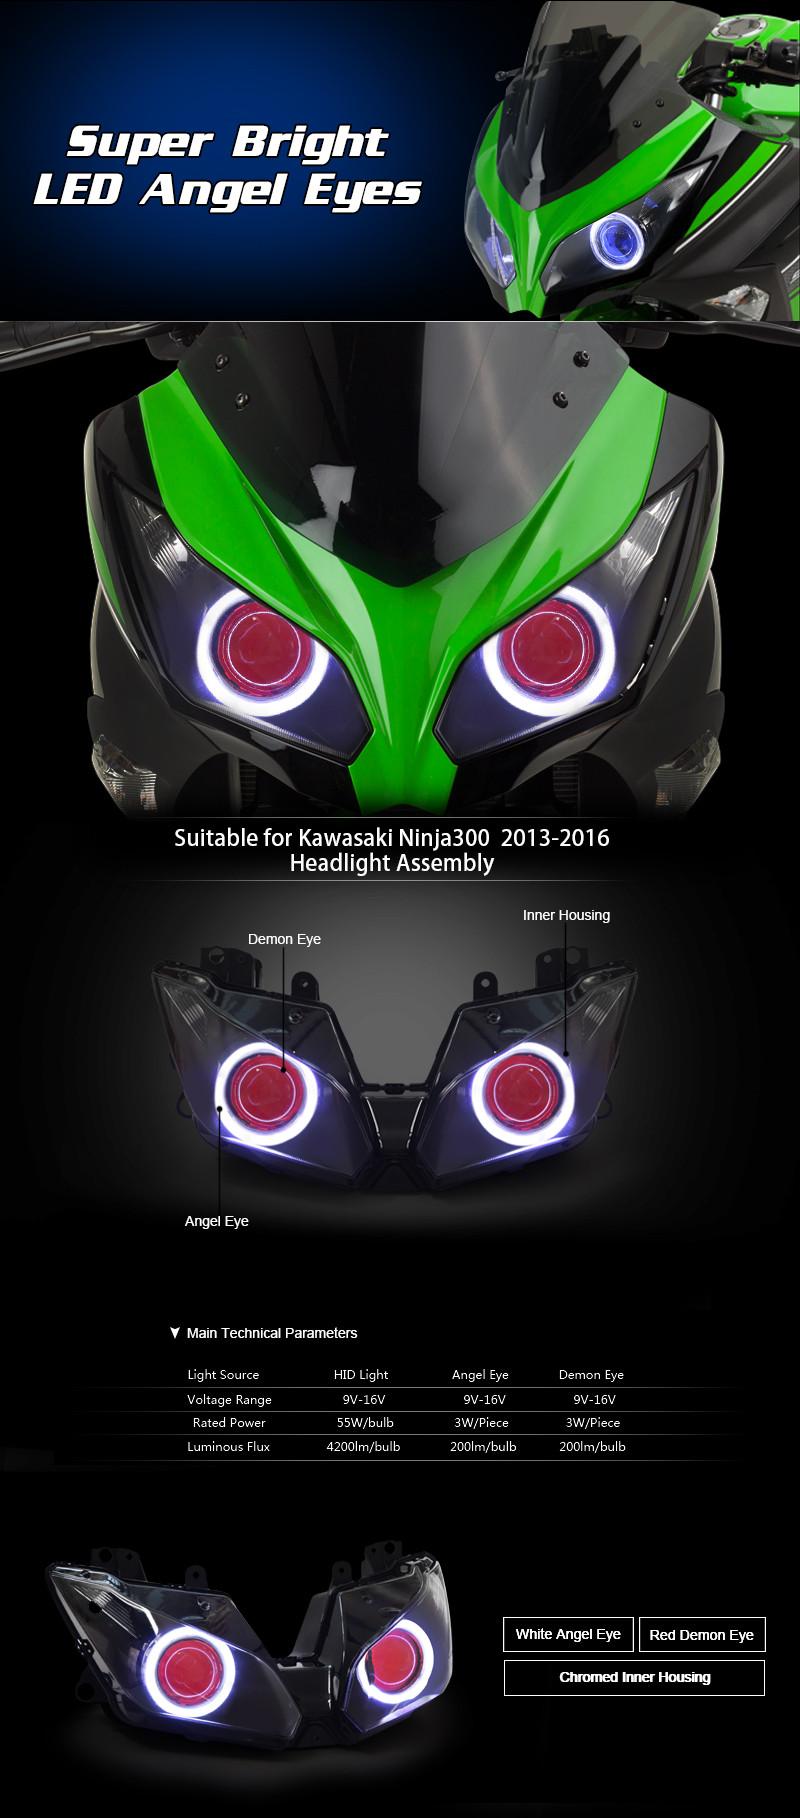 KT Headlight for Kawasaki Ninja 300 2013-2016 LED Angel Eye Red Demon Eye Motorcycle HID Projector Assembly 2014 2015